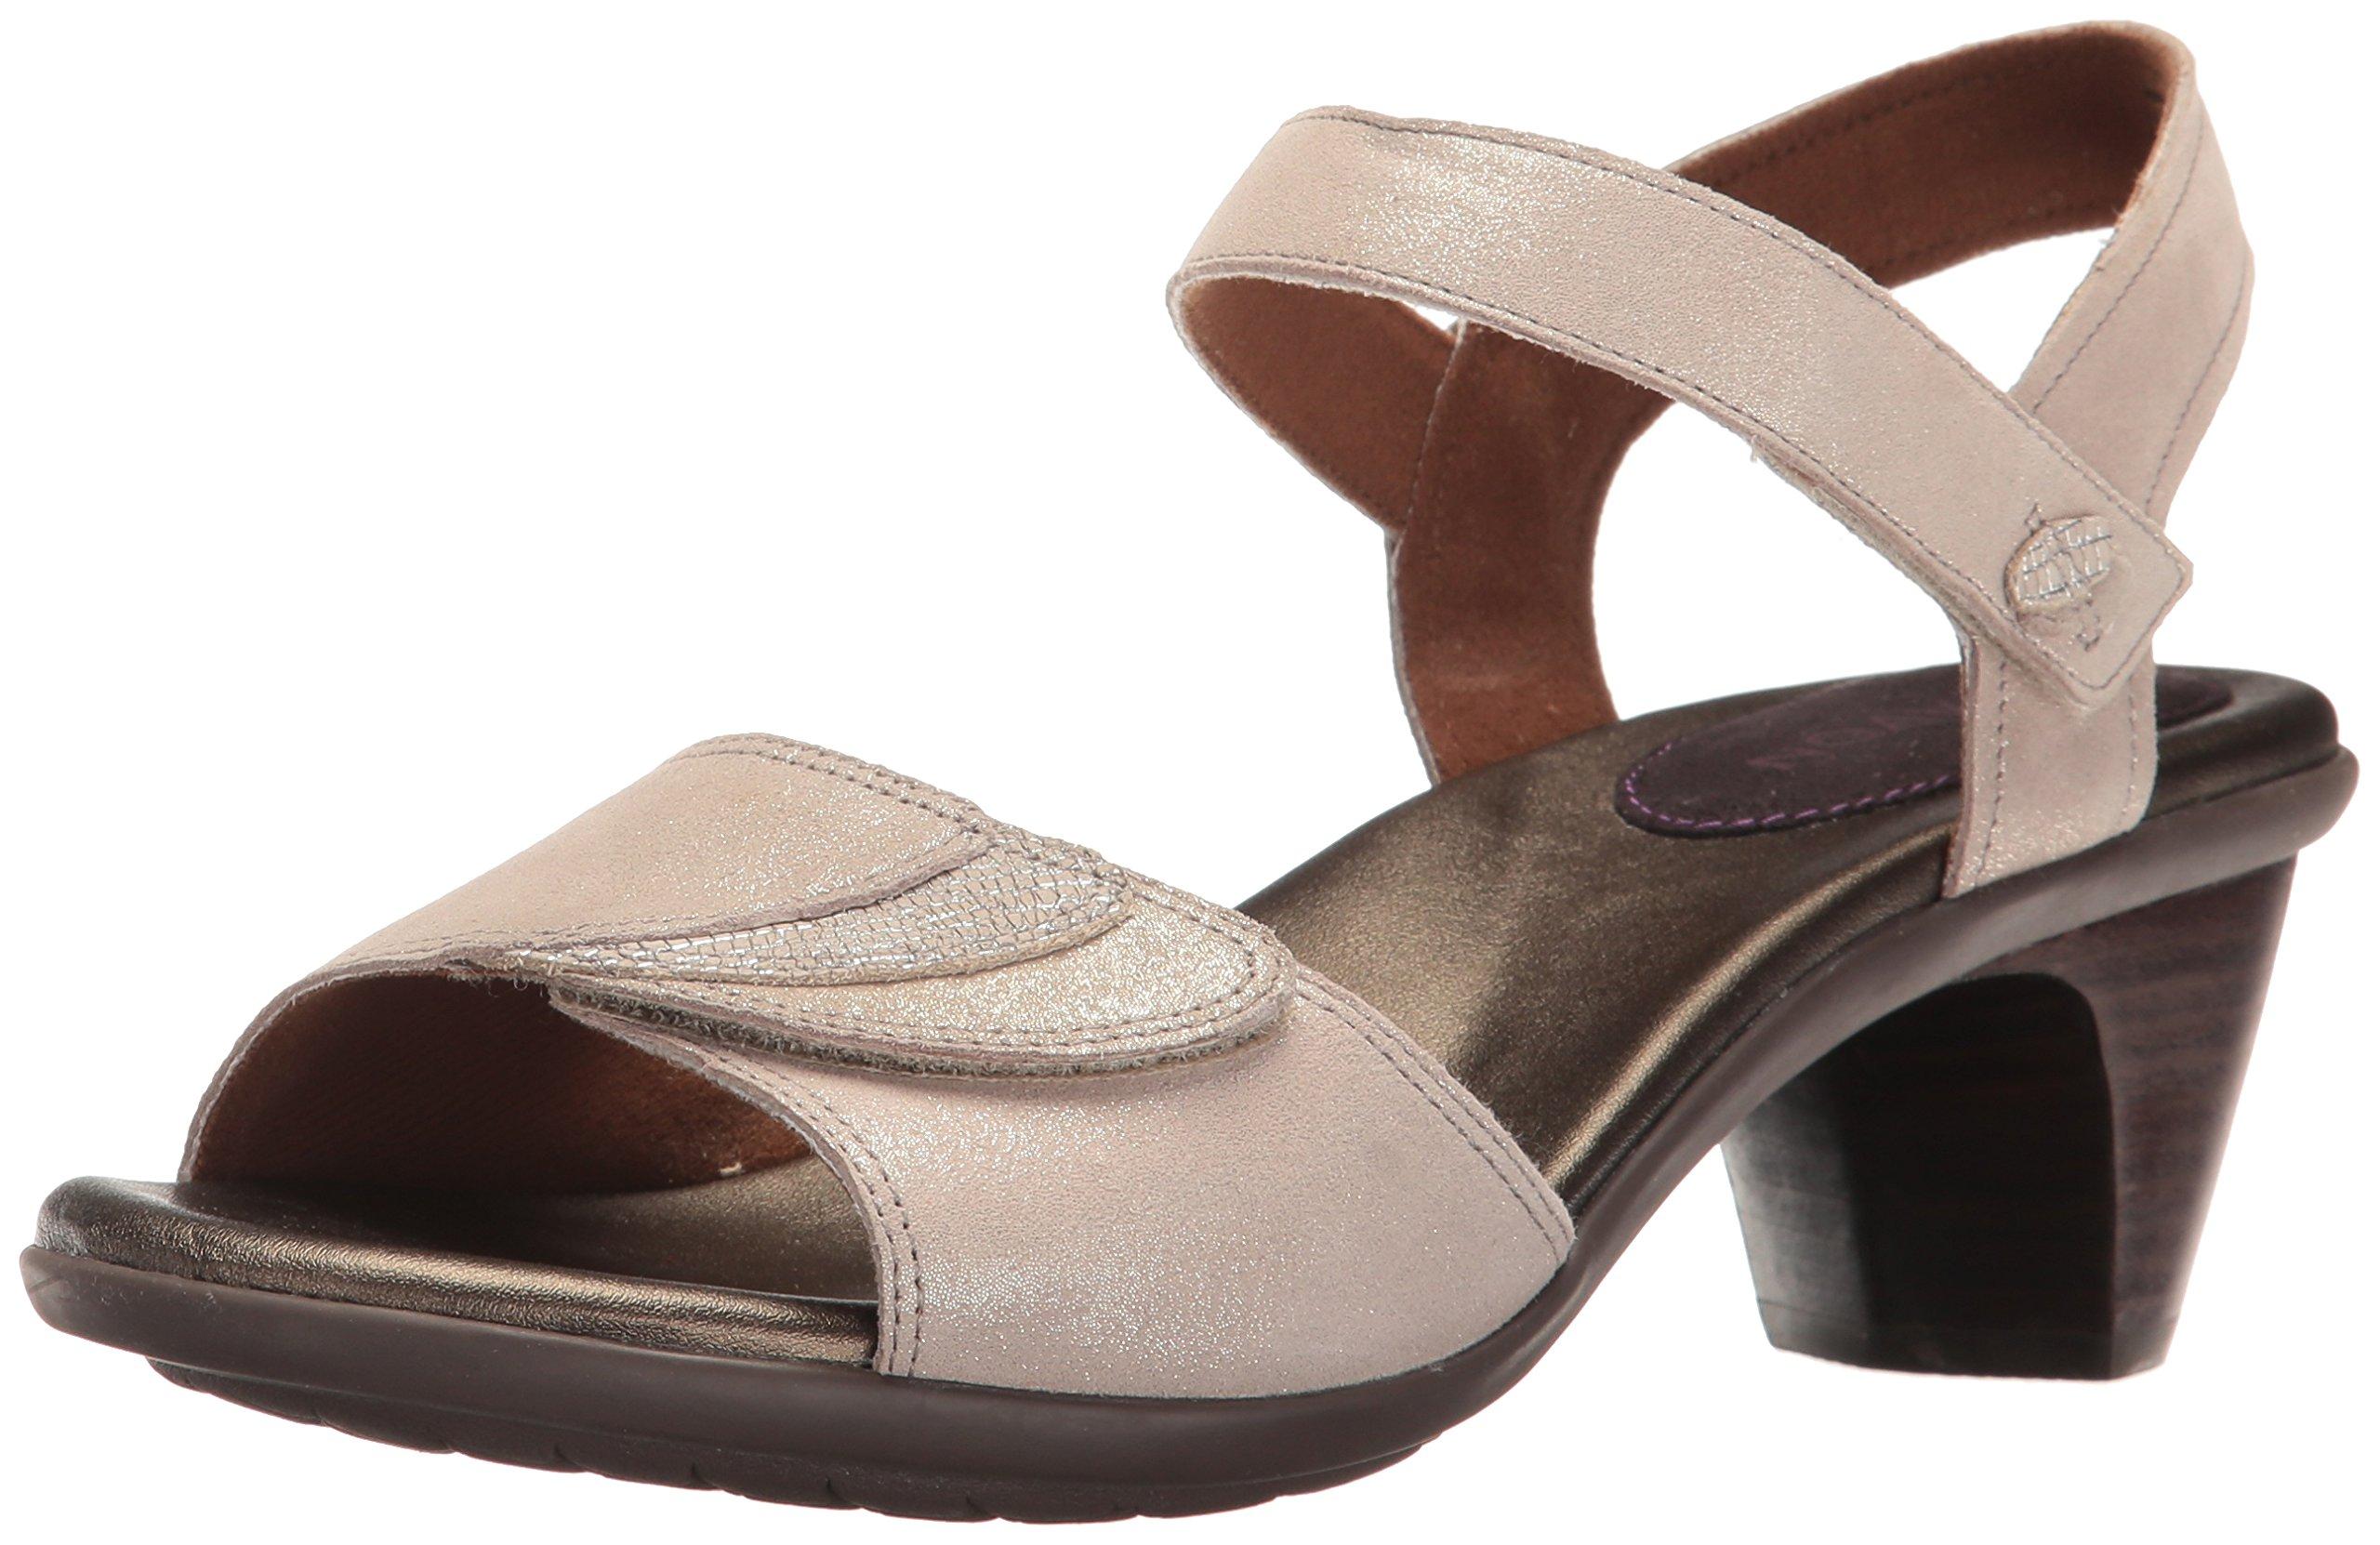 Aravon Women's Medici Heeled Sandal, Metallic, 10 B US